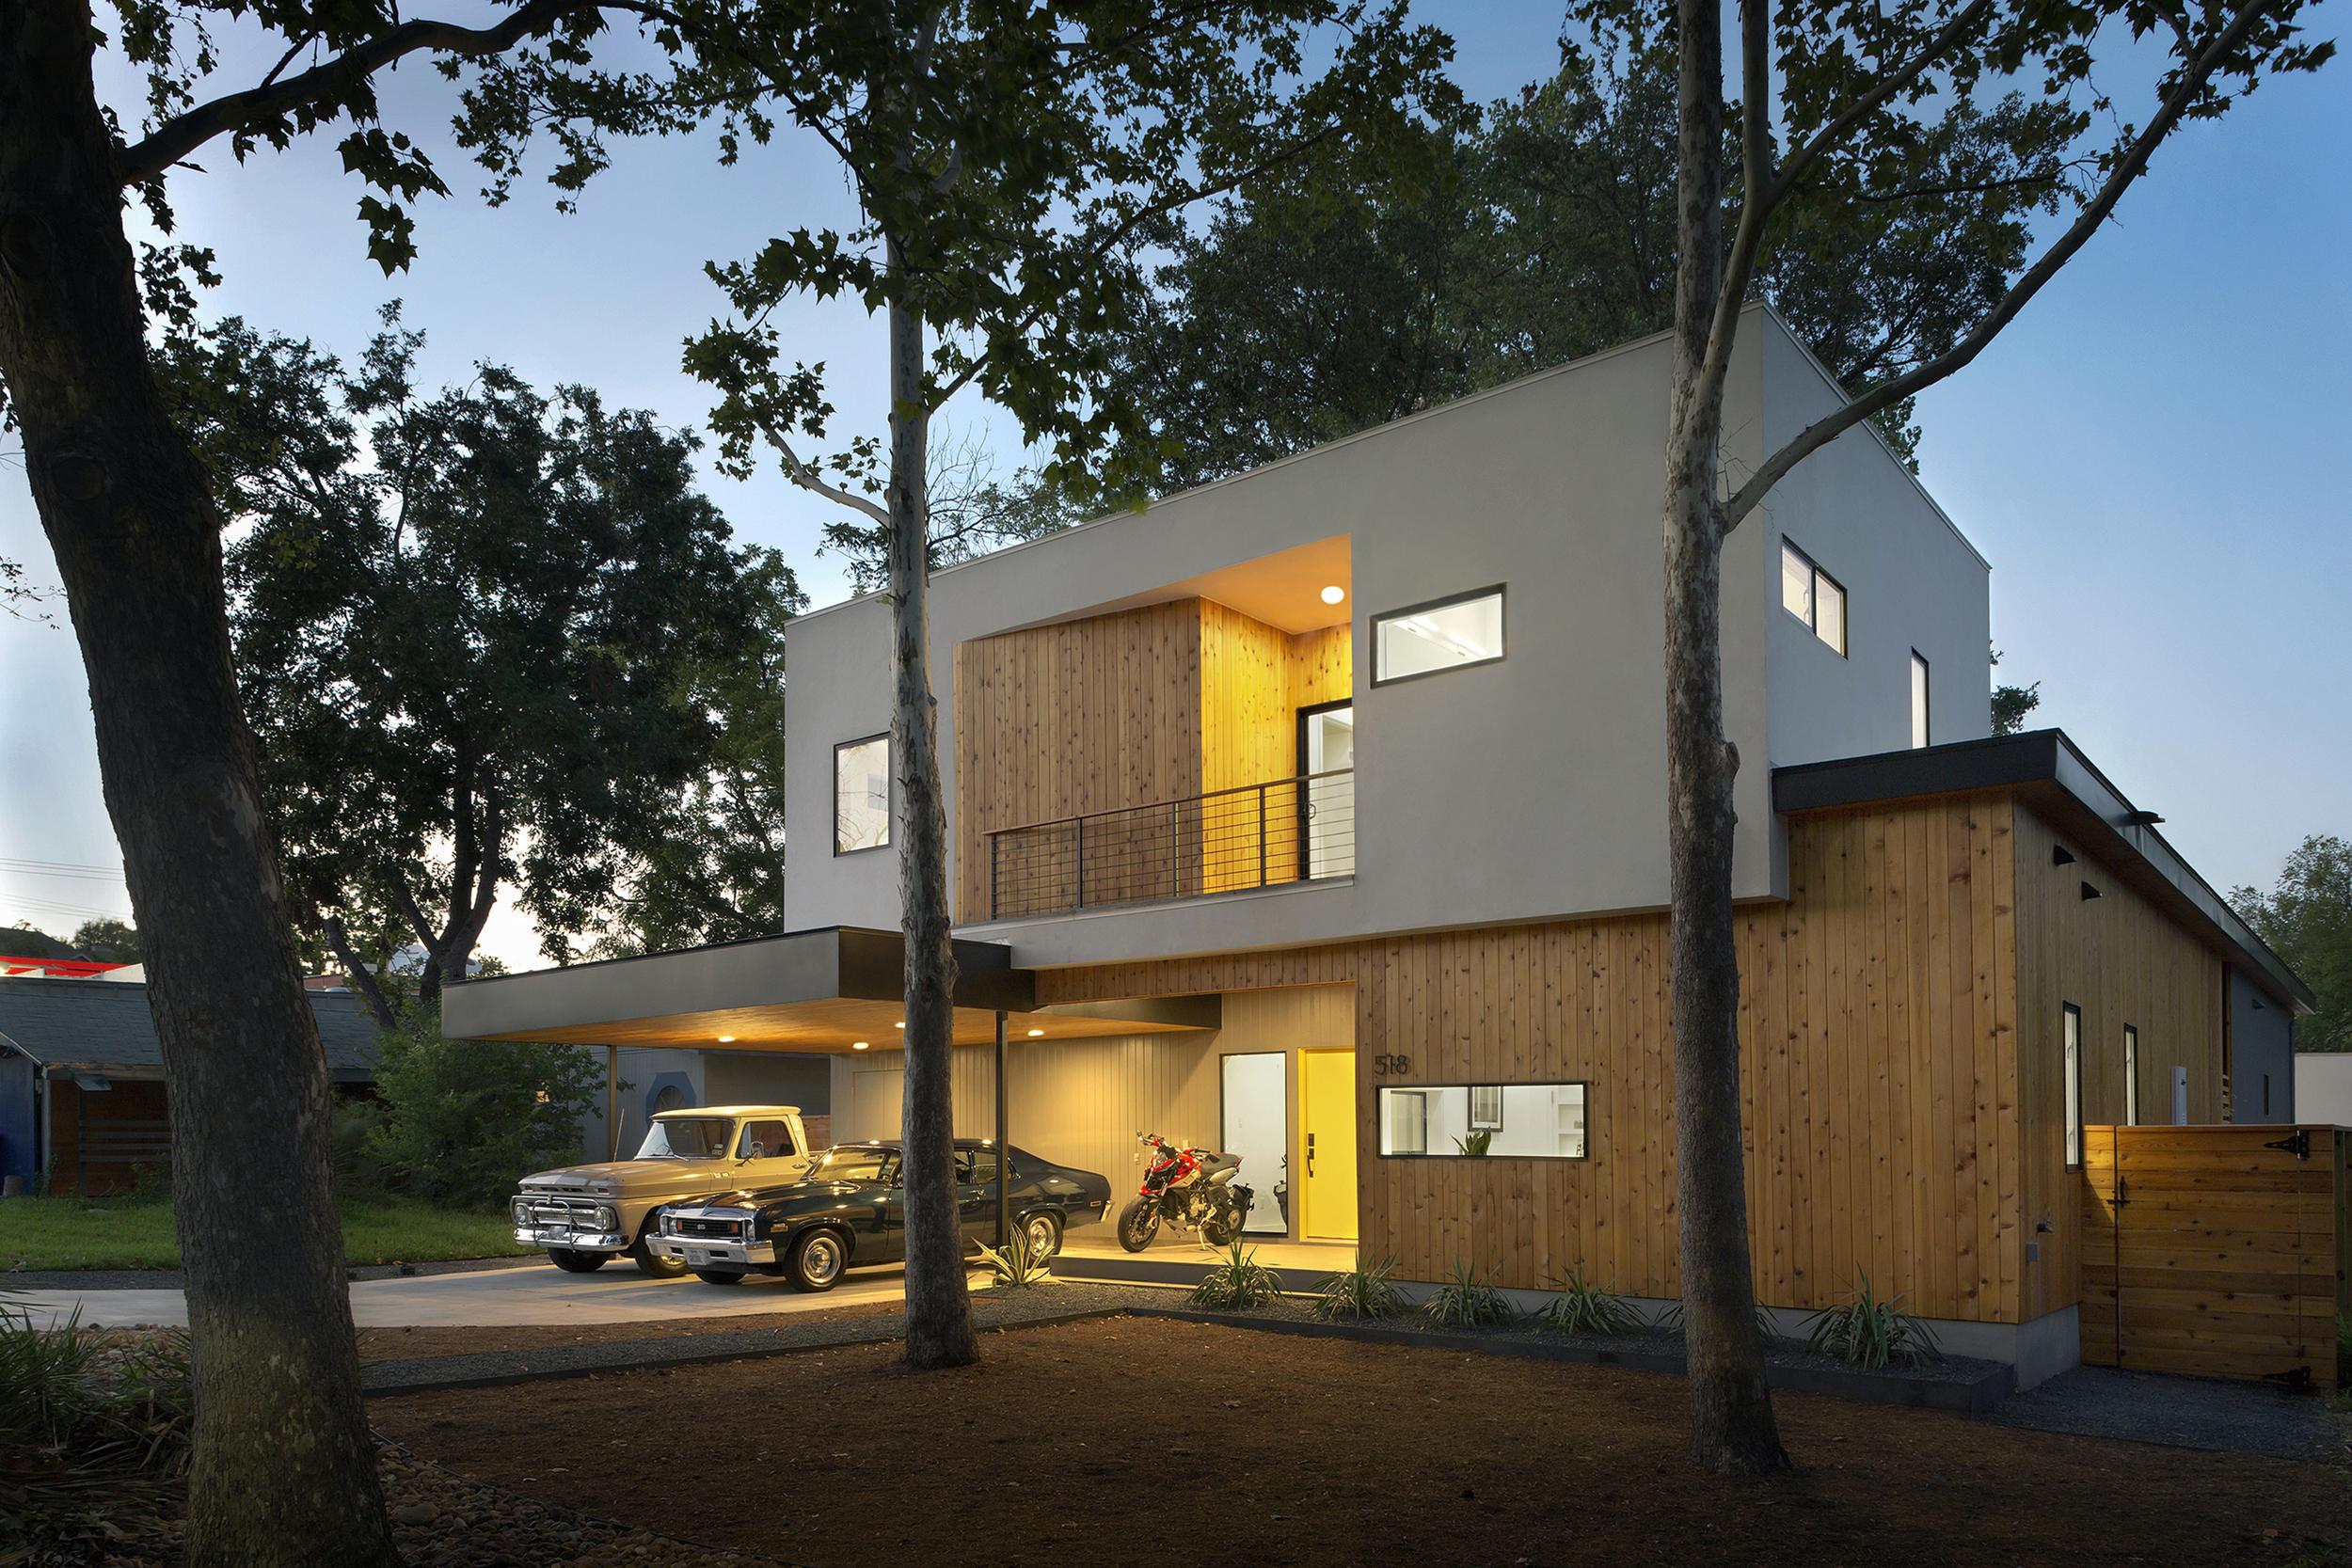 Matt Fajkus MF Architecture Tree House_Perspective Front Photo Brian Mihealsick.jpg